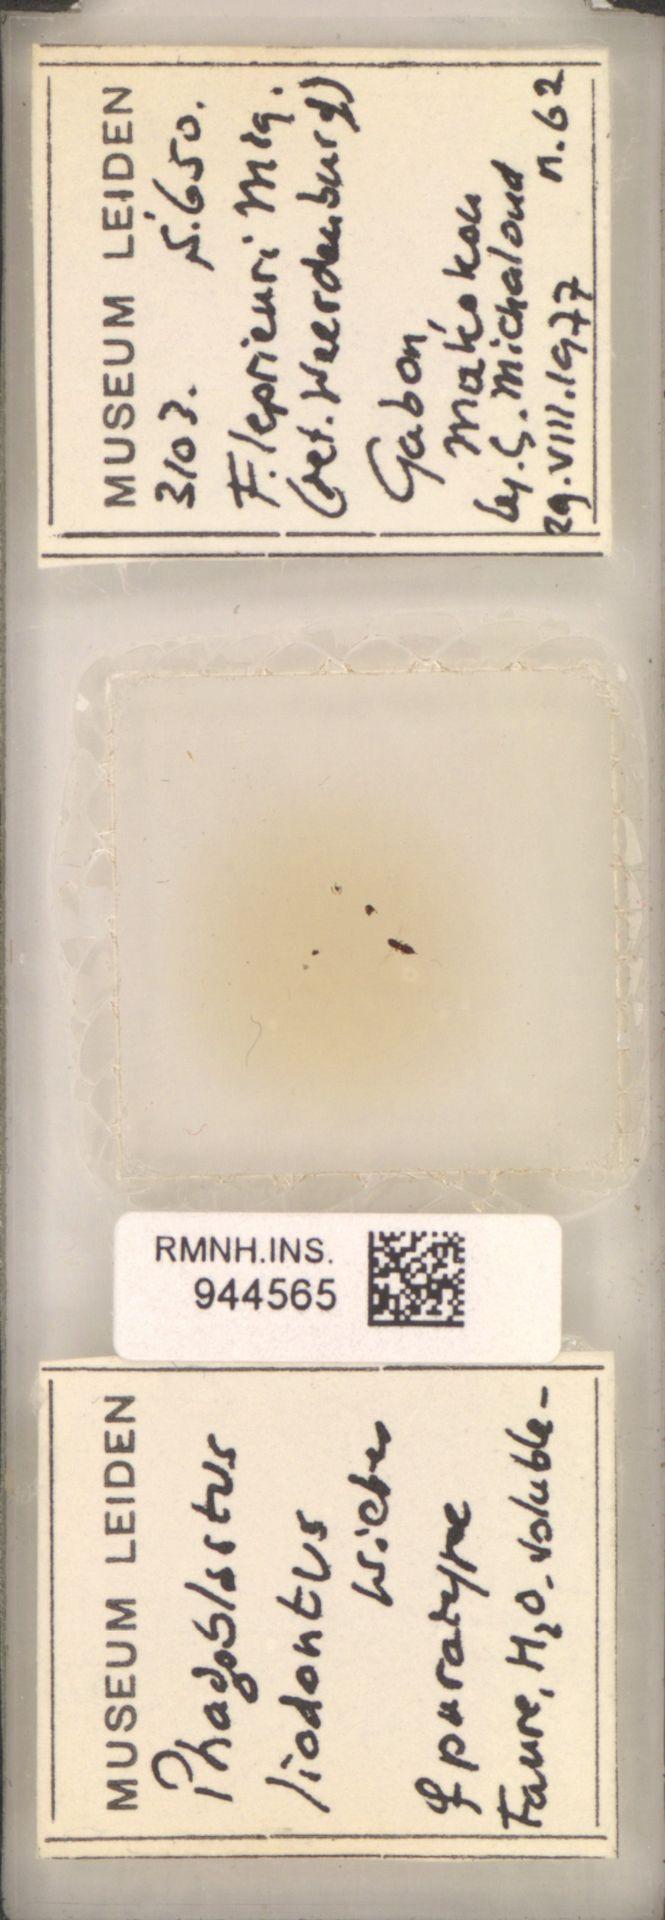 RMNH.INS.944565 | Phagoblastus liodontus Wiebes